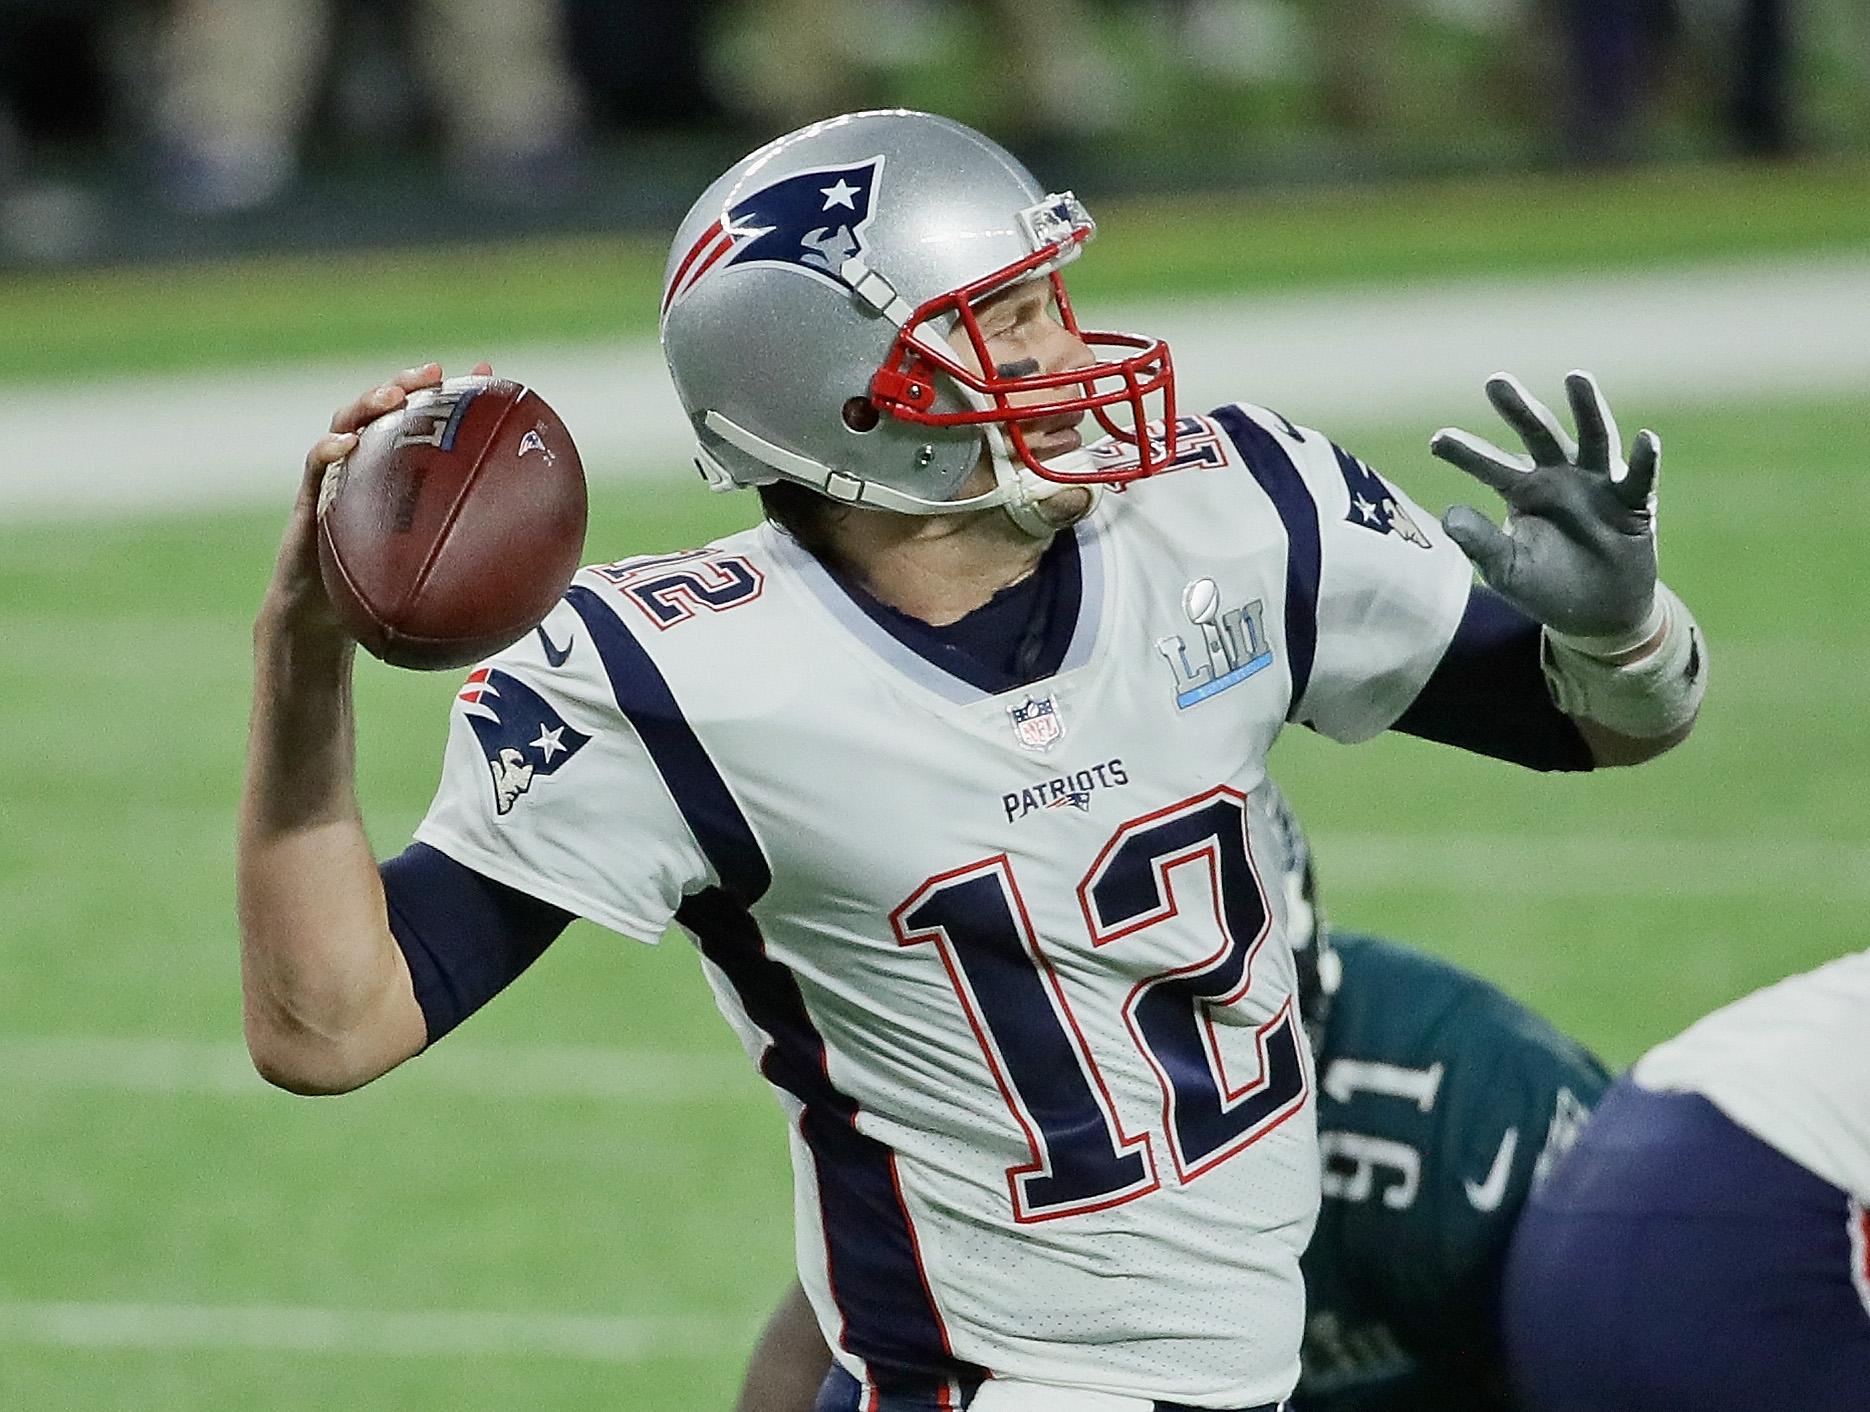 9263ac5b740 Preseason Week 1: Patriots mount greatest comeback in franchise history in 2018  vs Washington, win 26-17